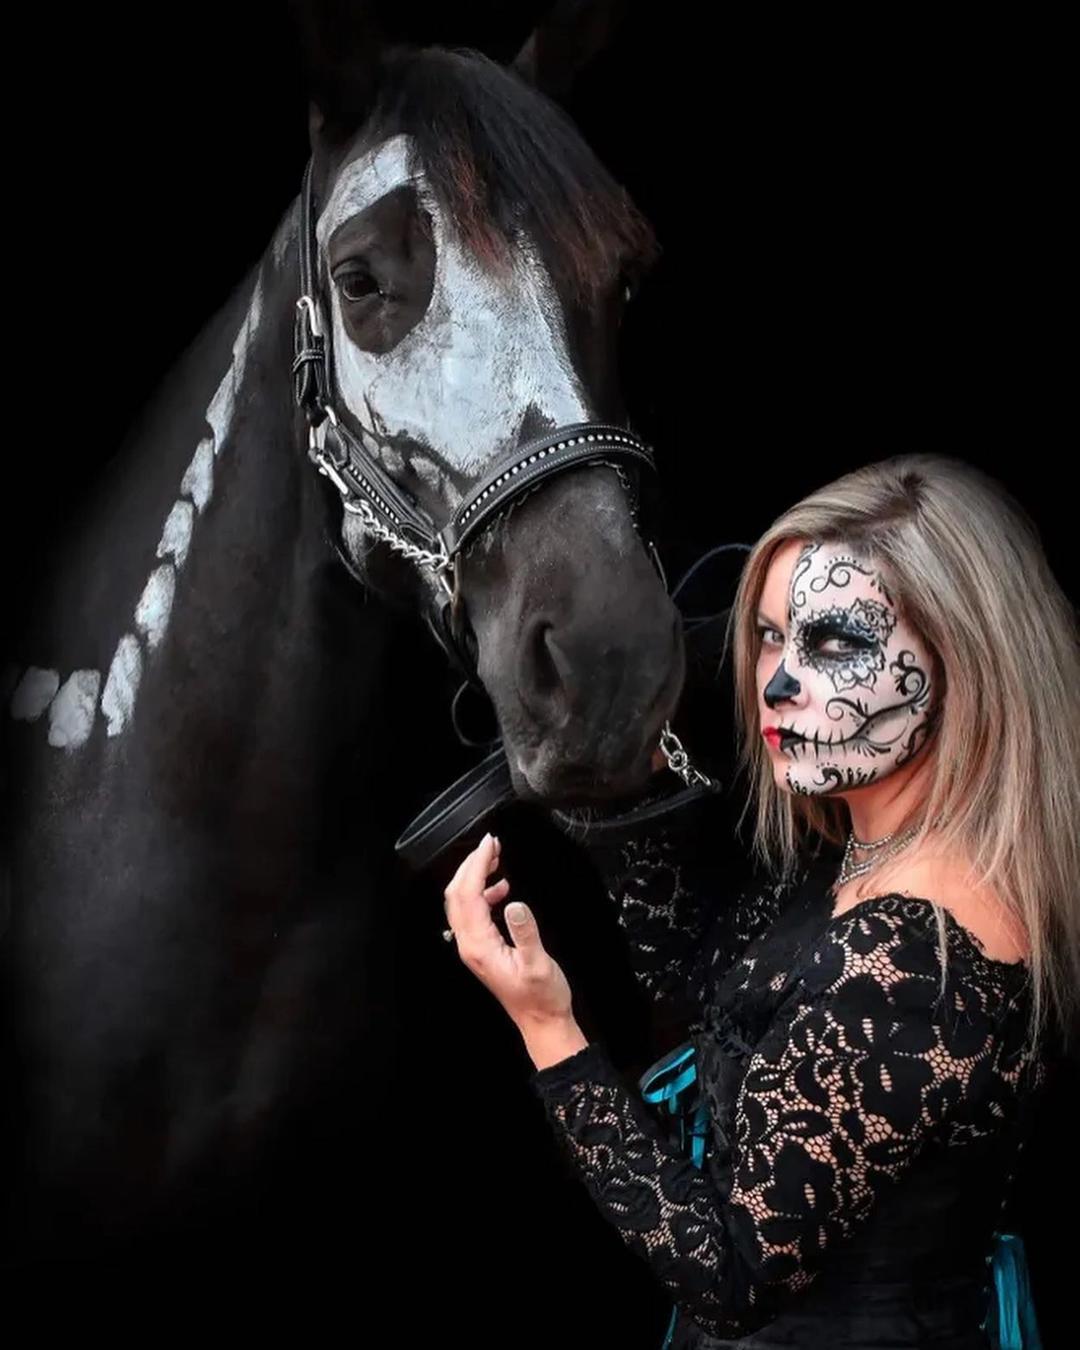 Skeleton Horse & Sugar Skull by Mollie H.